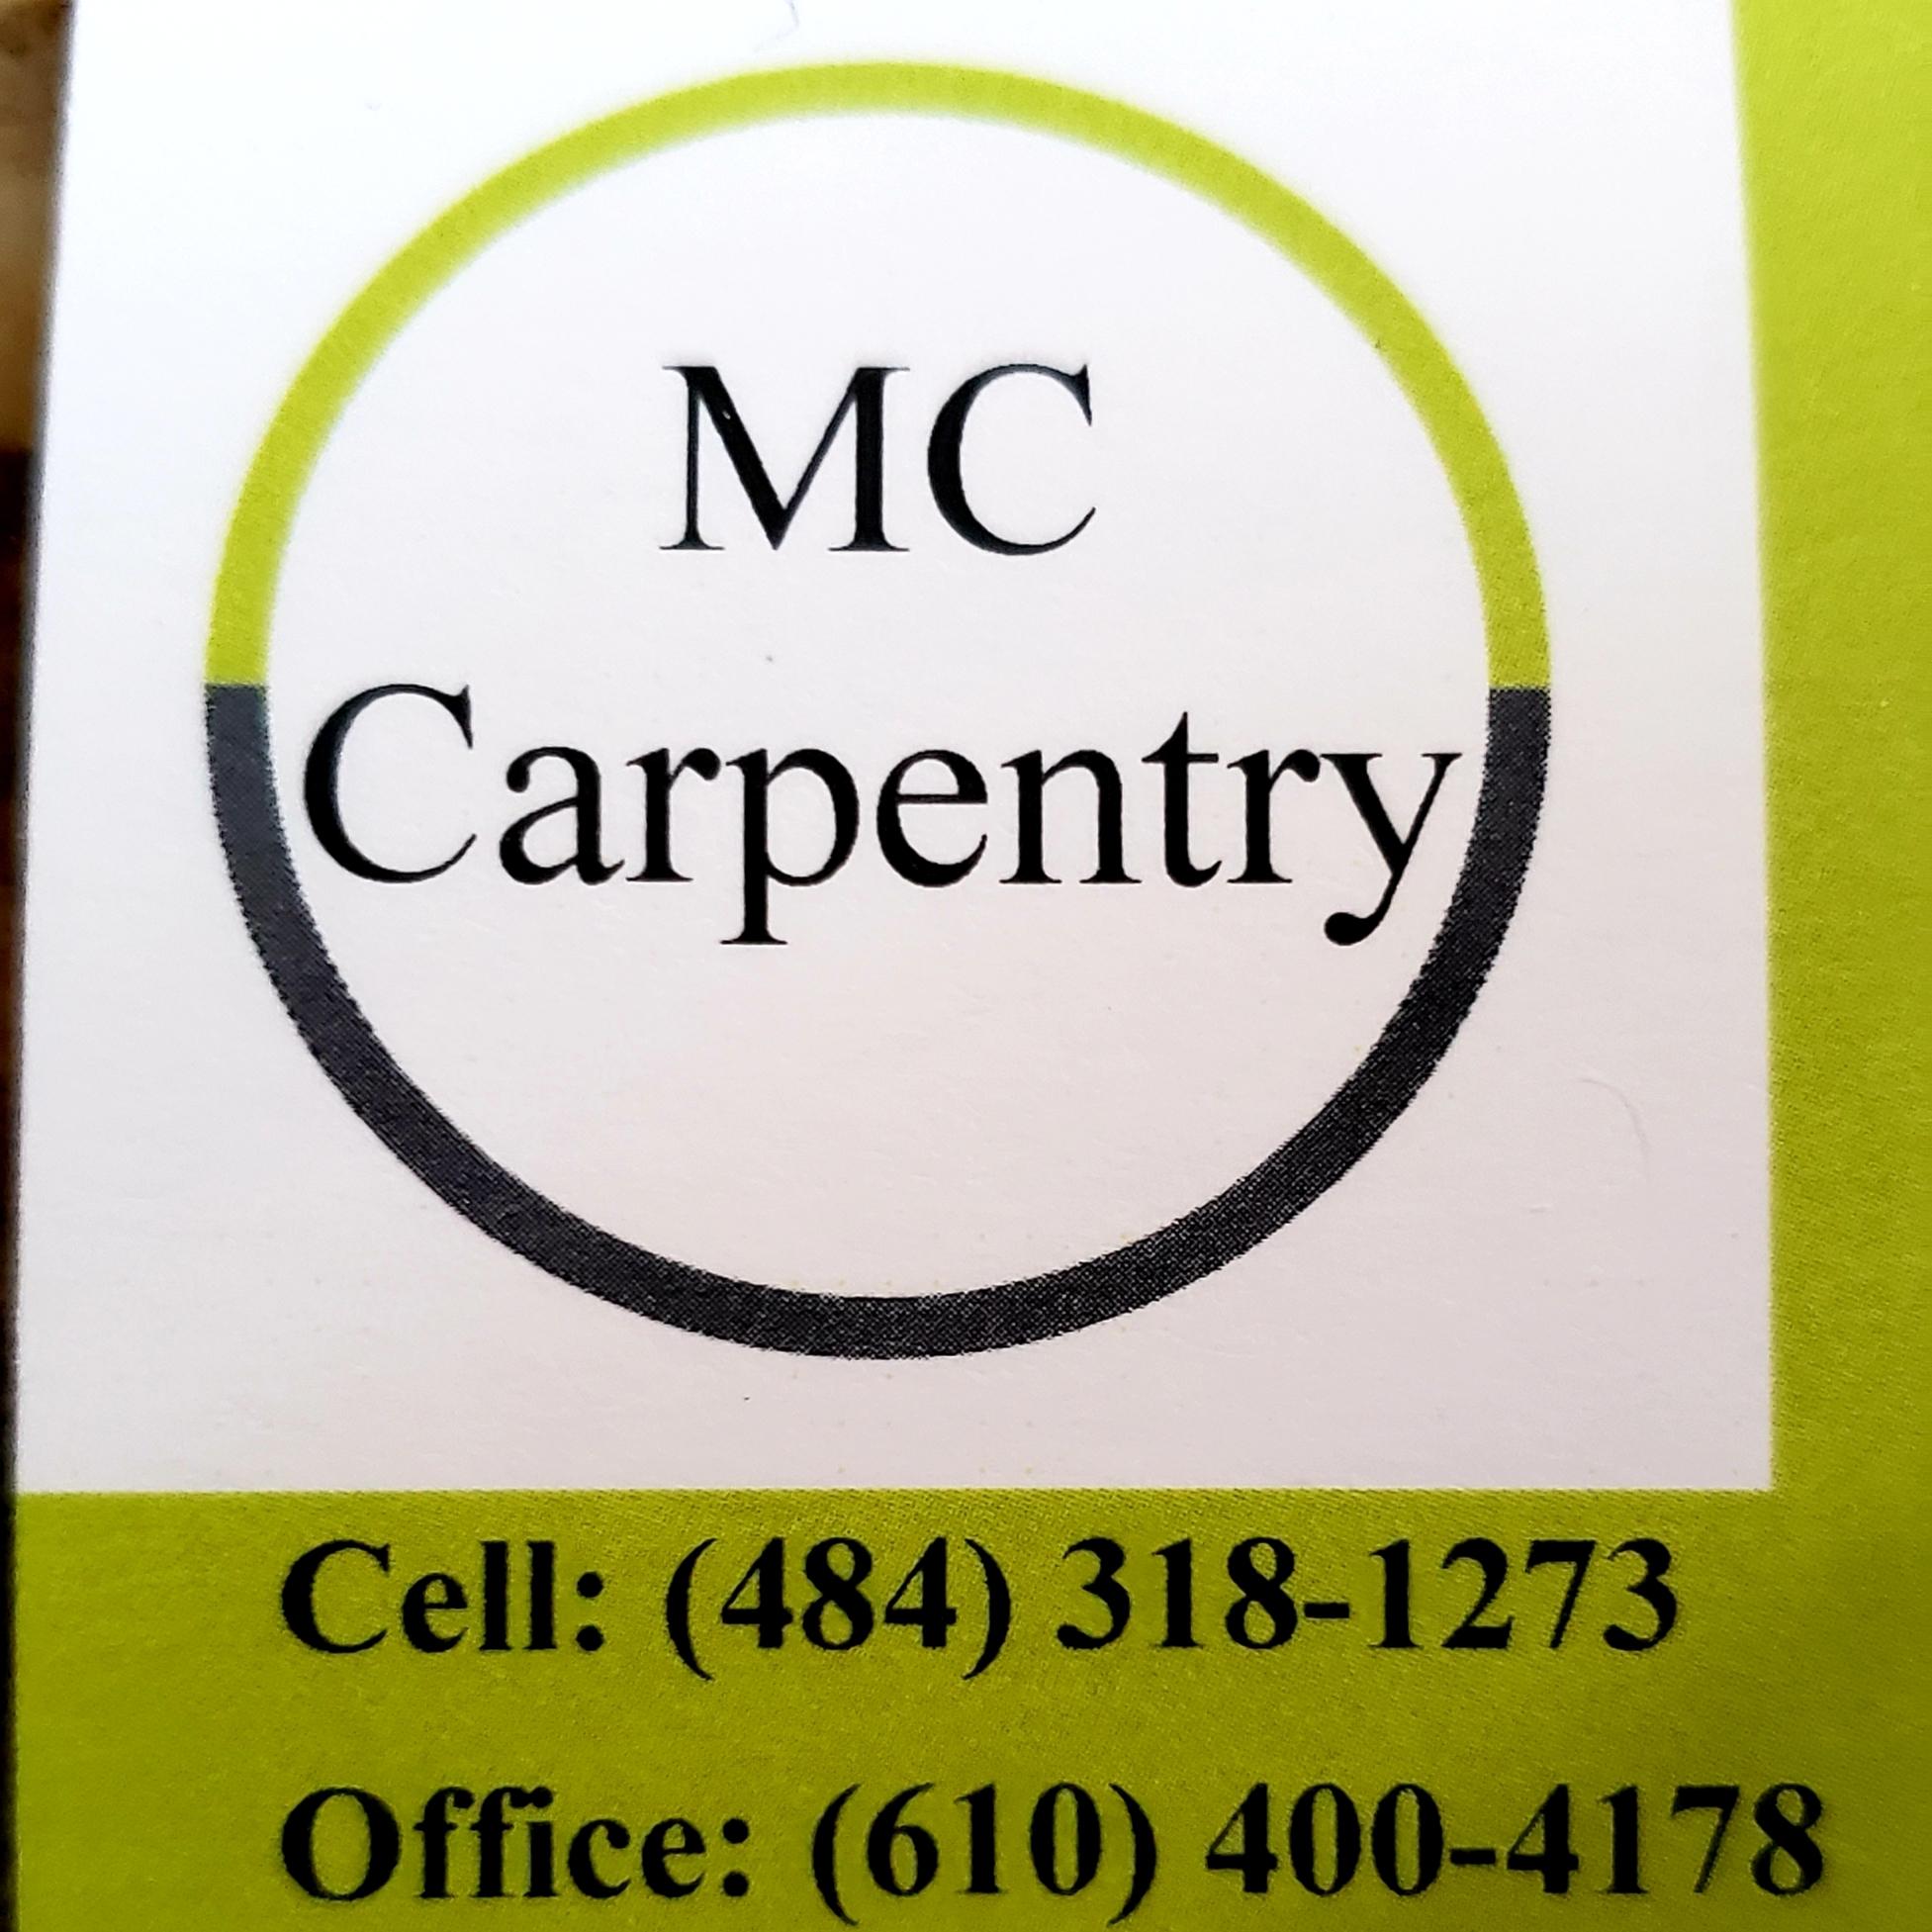 MC Carpentry